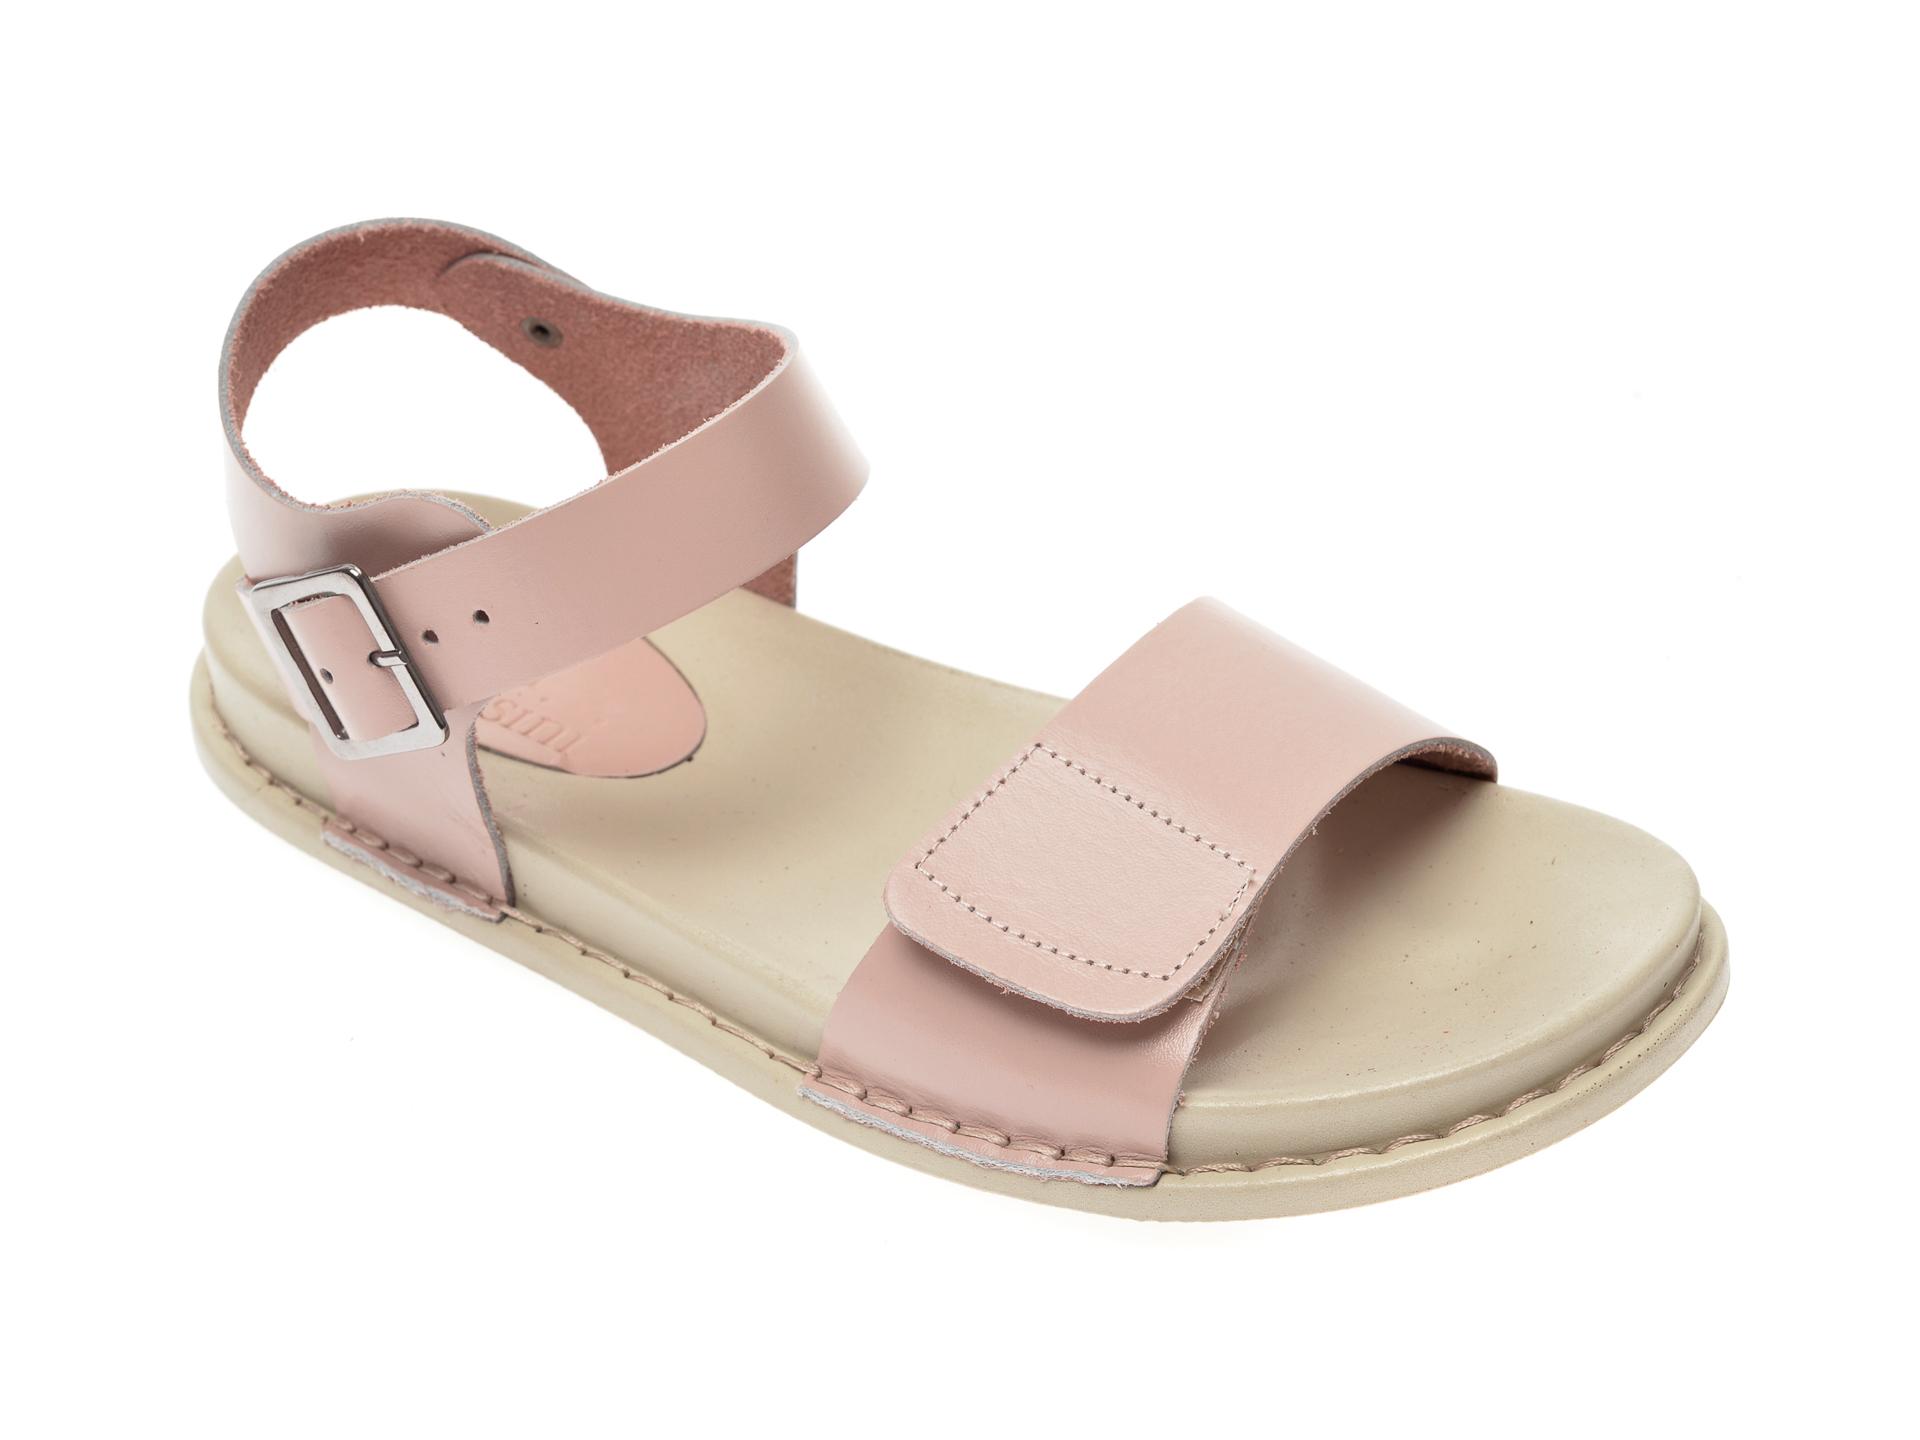 Sandale FLAVIA PASSINI nude, 1306, din piele naturala